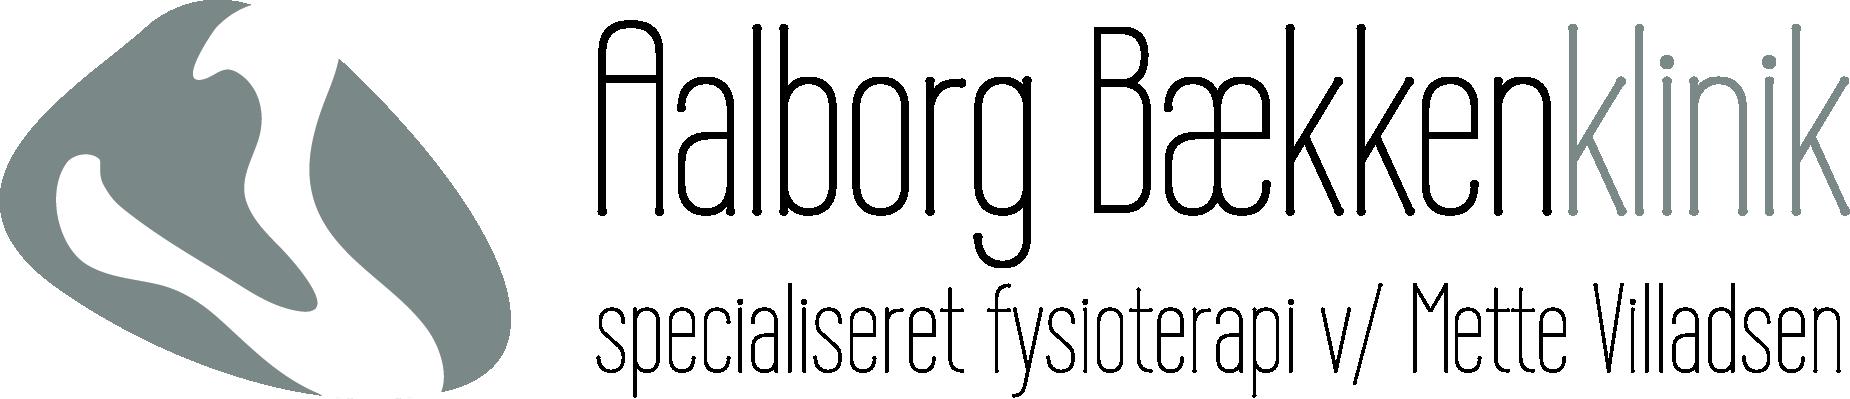 Grafisk materiale for Aalborg Bækkenklinik